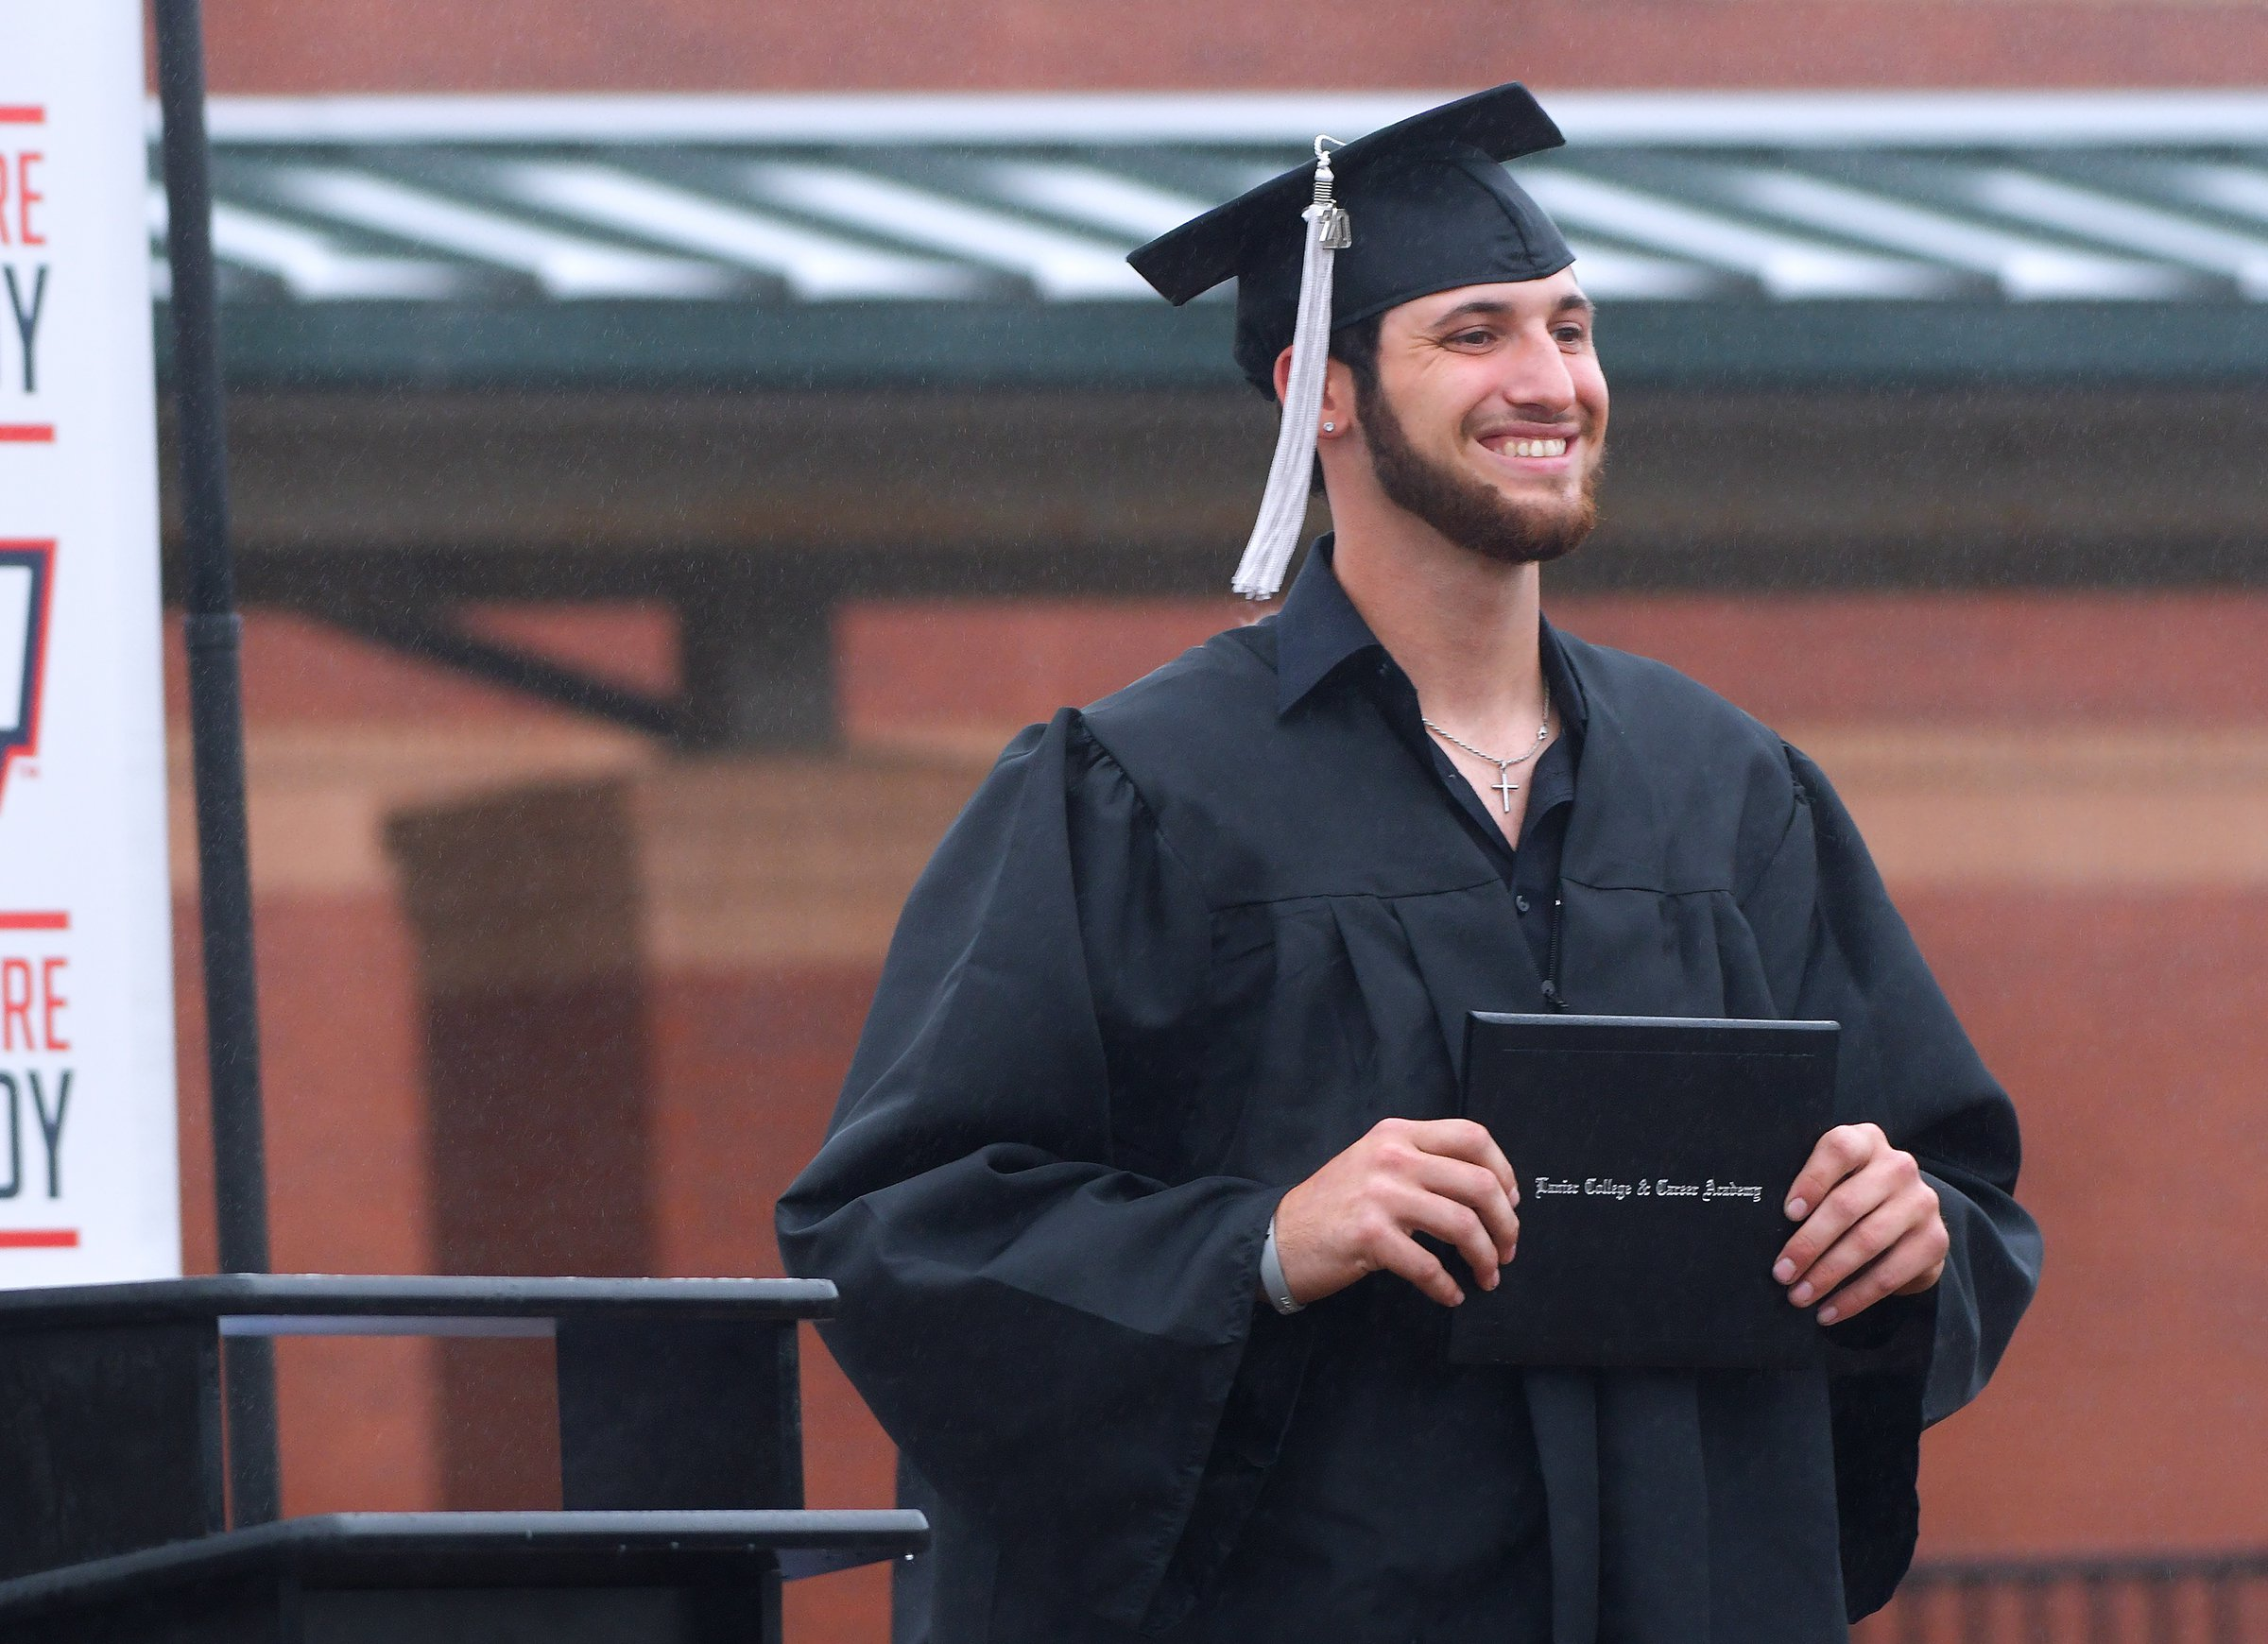 LCCA Graduation 2020 5.jpg